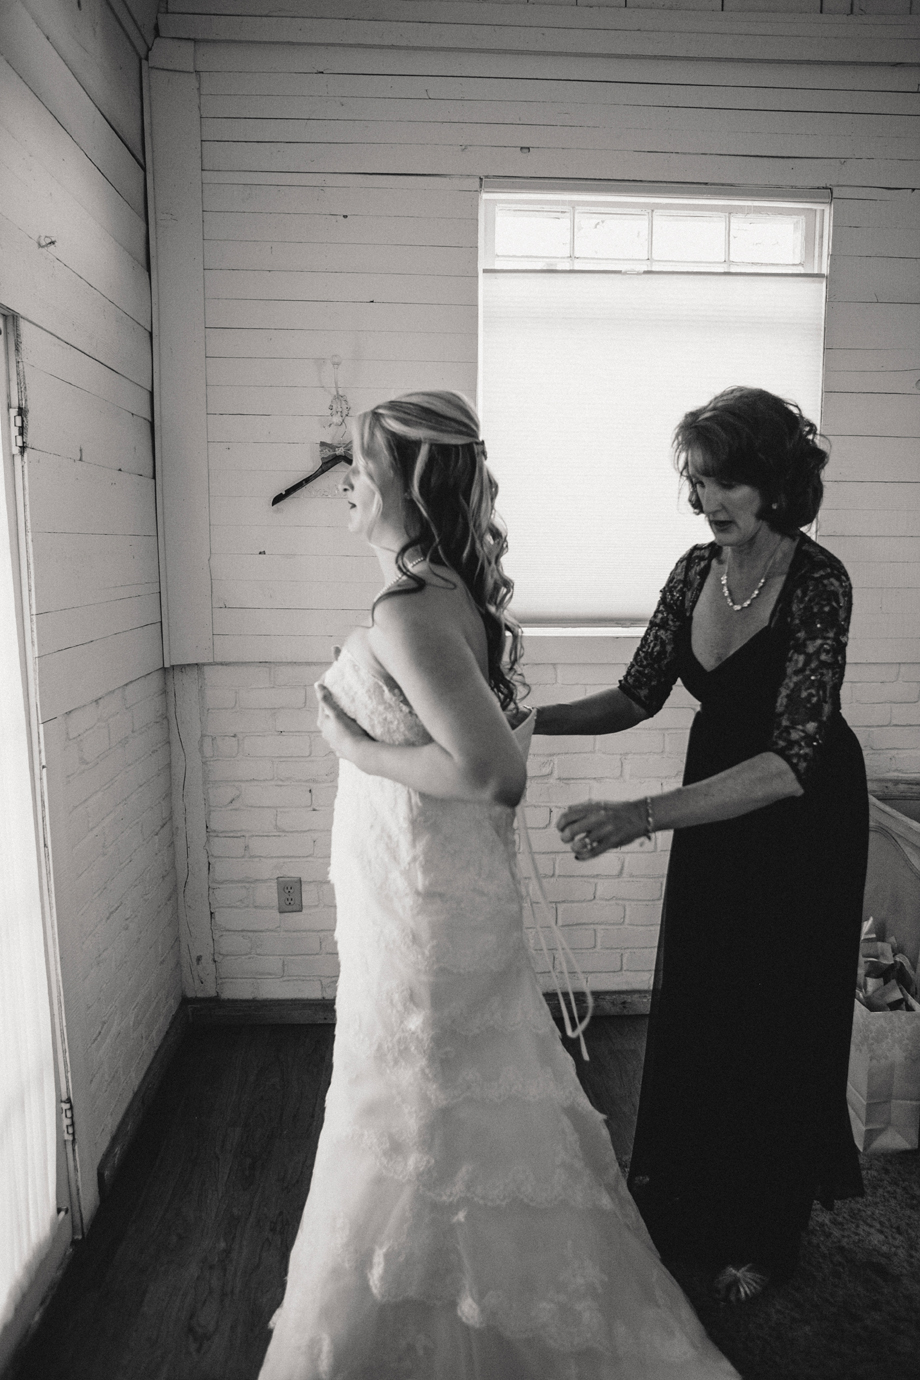 Jay & Jess, Weddings, Arizona-4.jpg